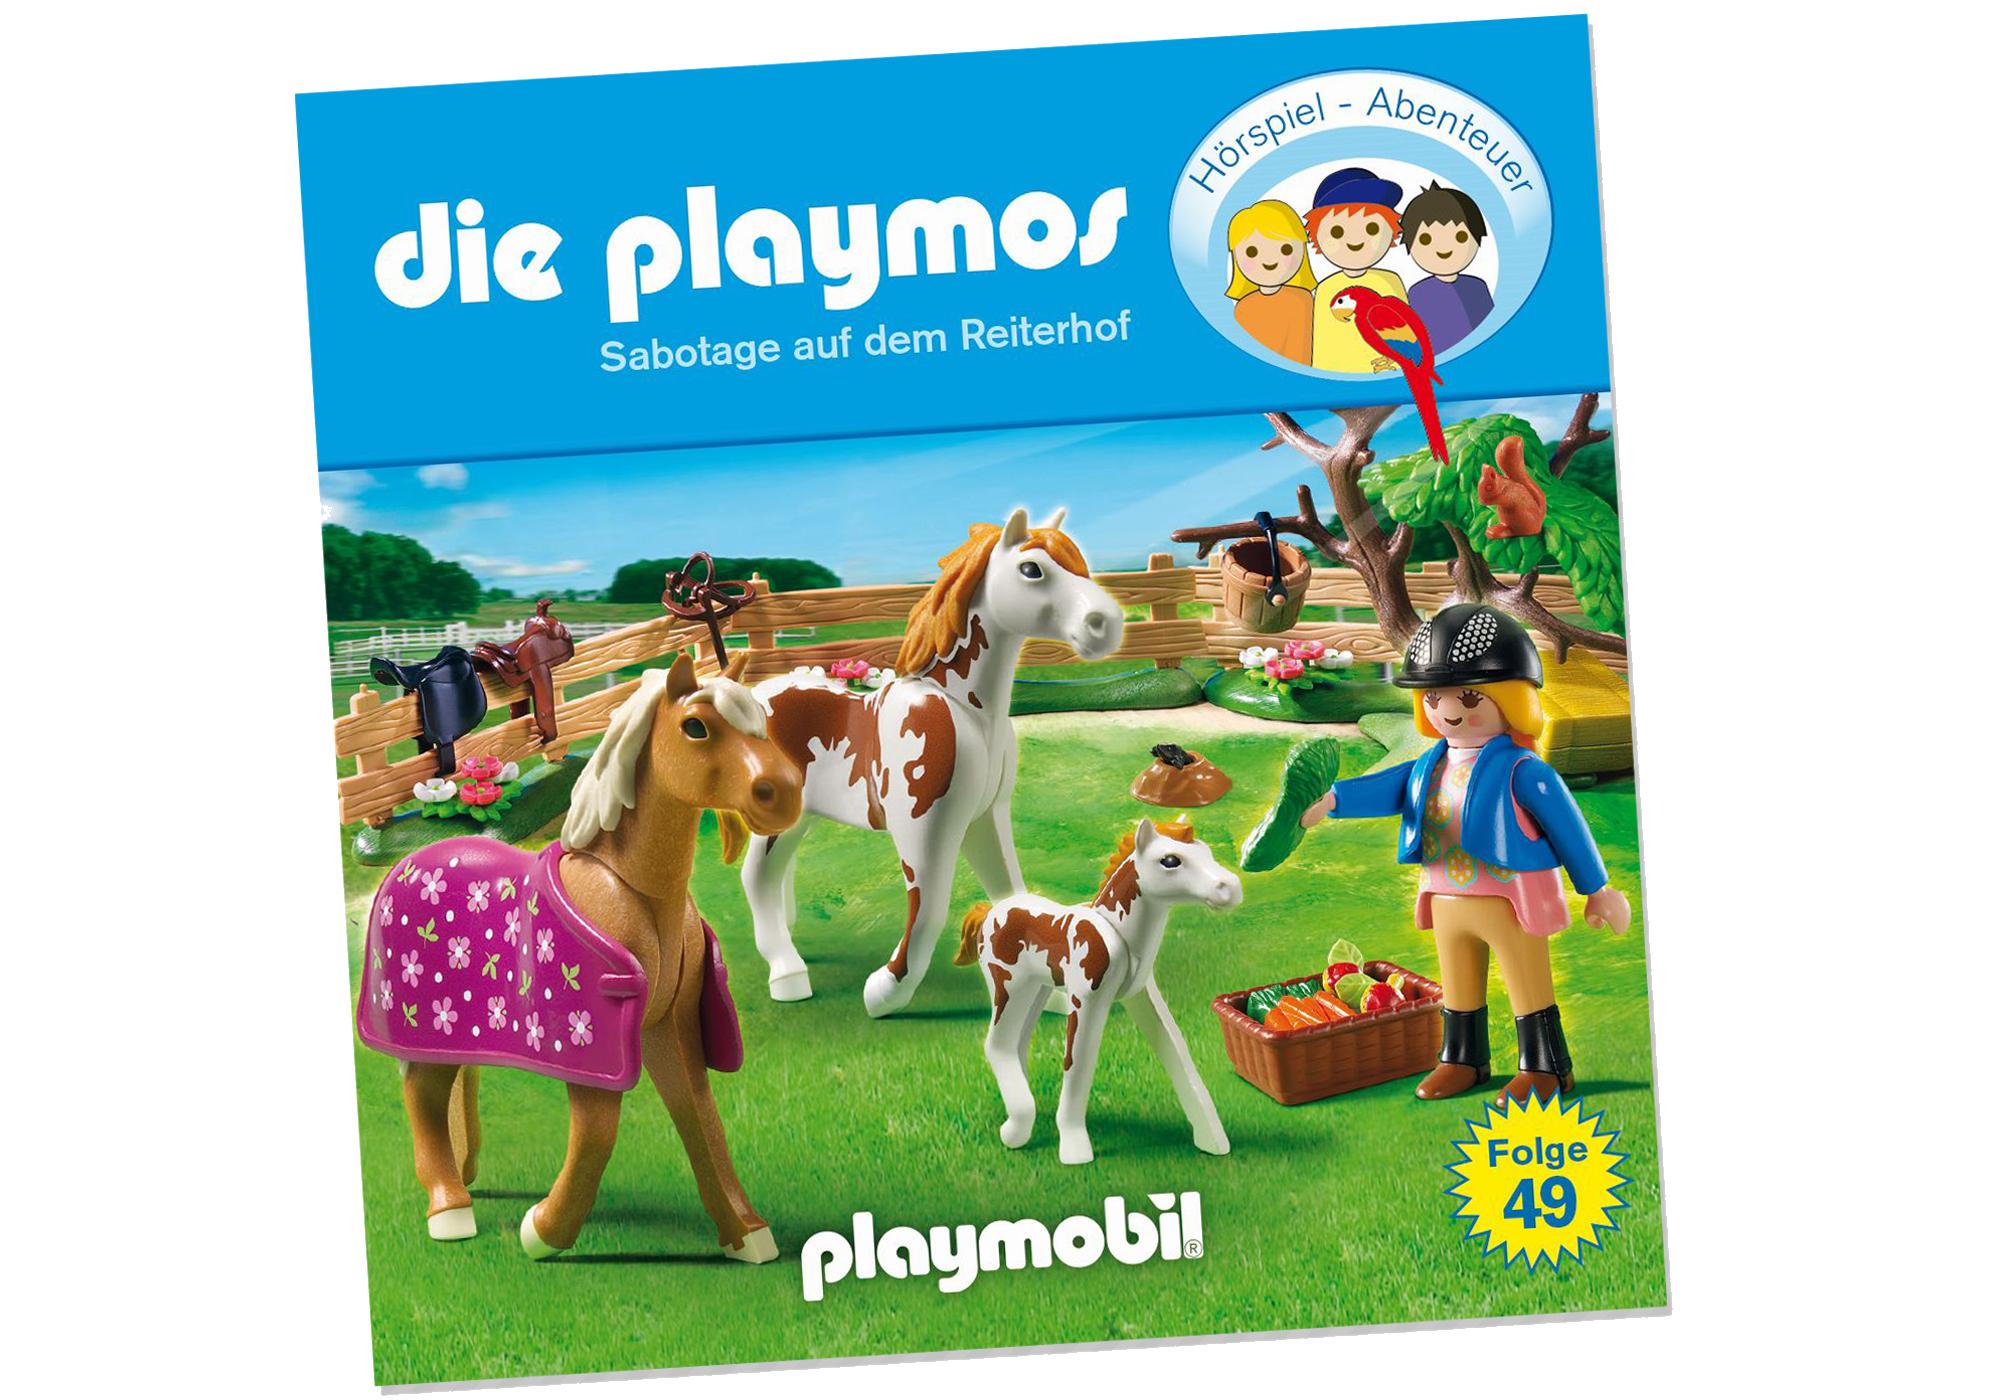 http://media.playmobil.com/i/playmobil/80256_product_detail